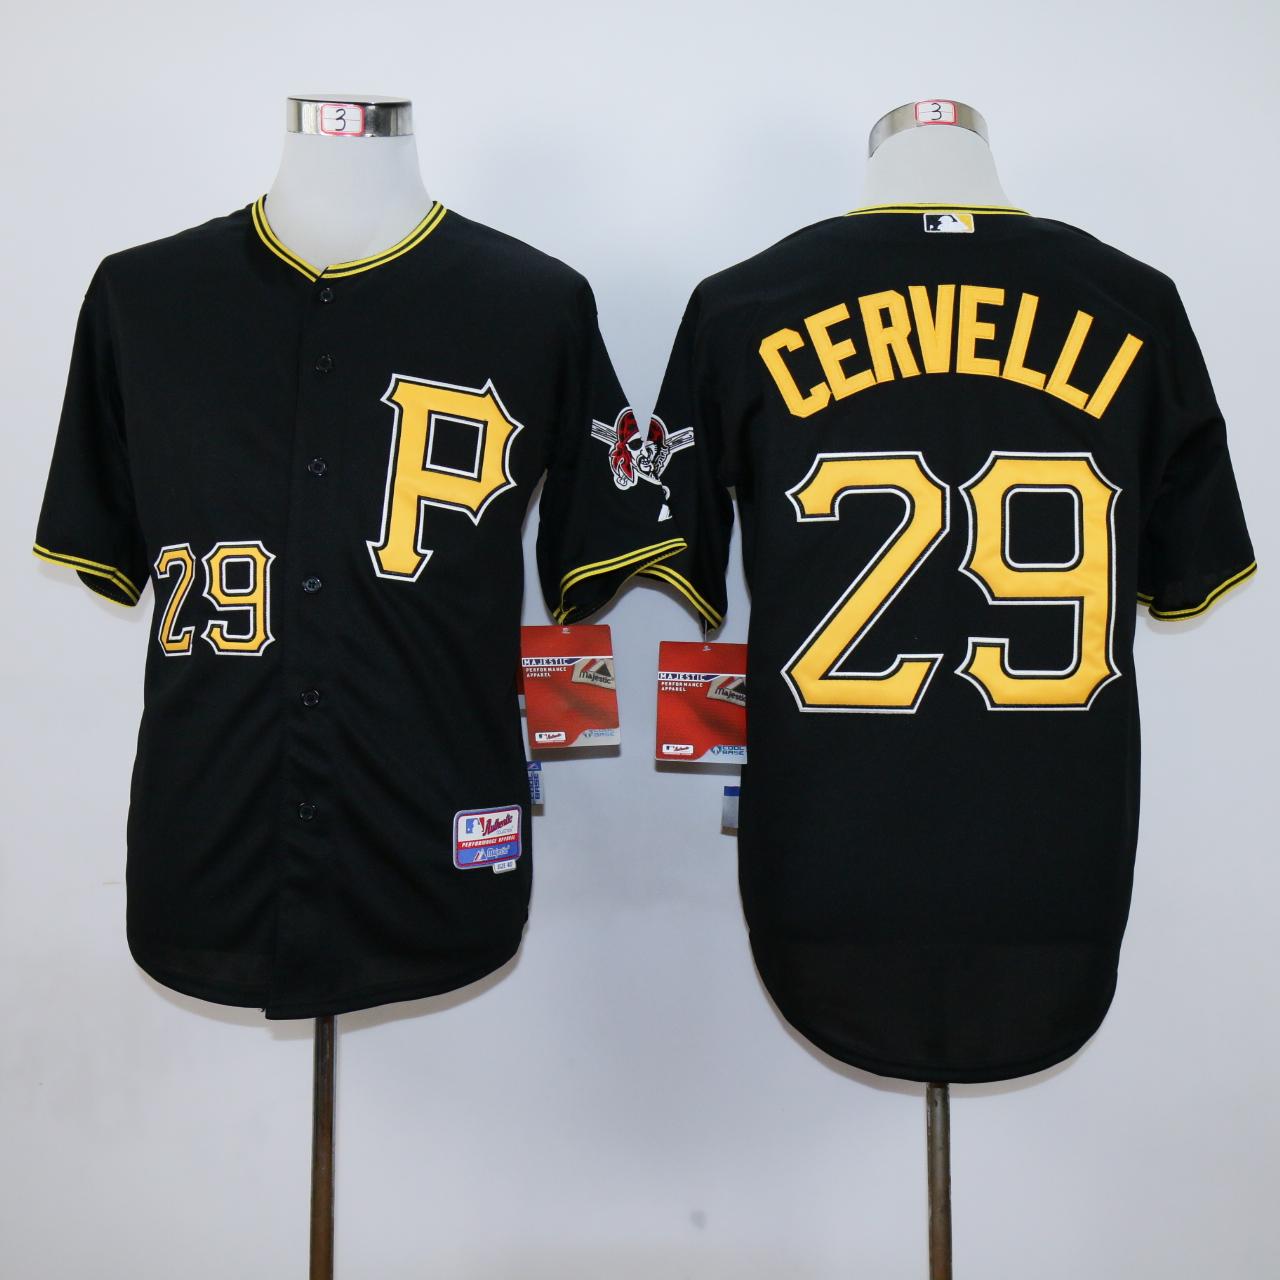 fe6b84c1a54 MLB Pittsburgh Pirates 29 Cervelli Black jerseys